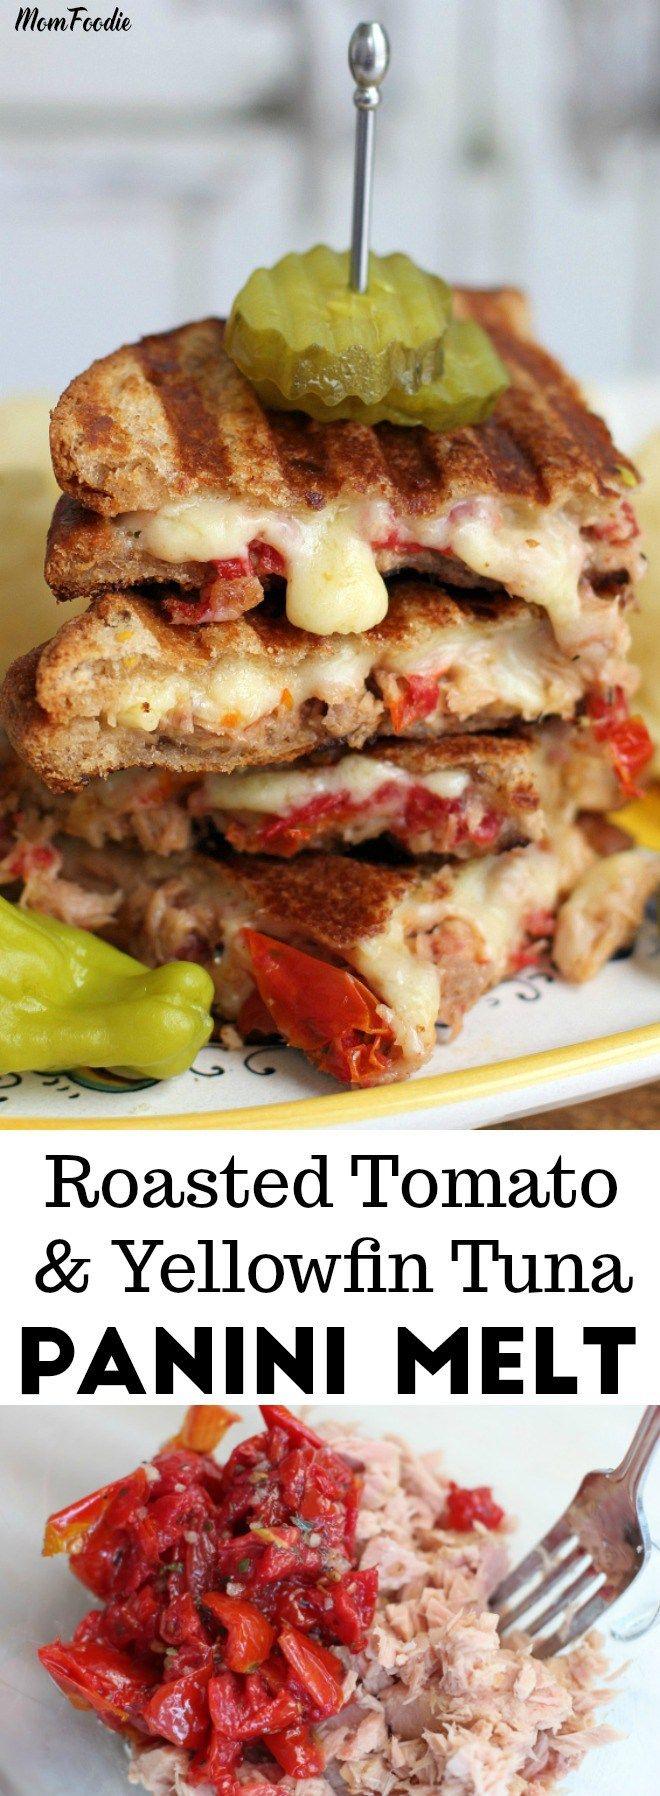 Gourmet Tuna Melt - Roasted Tomato and Yellowfin Tuna Panini Melt